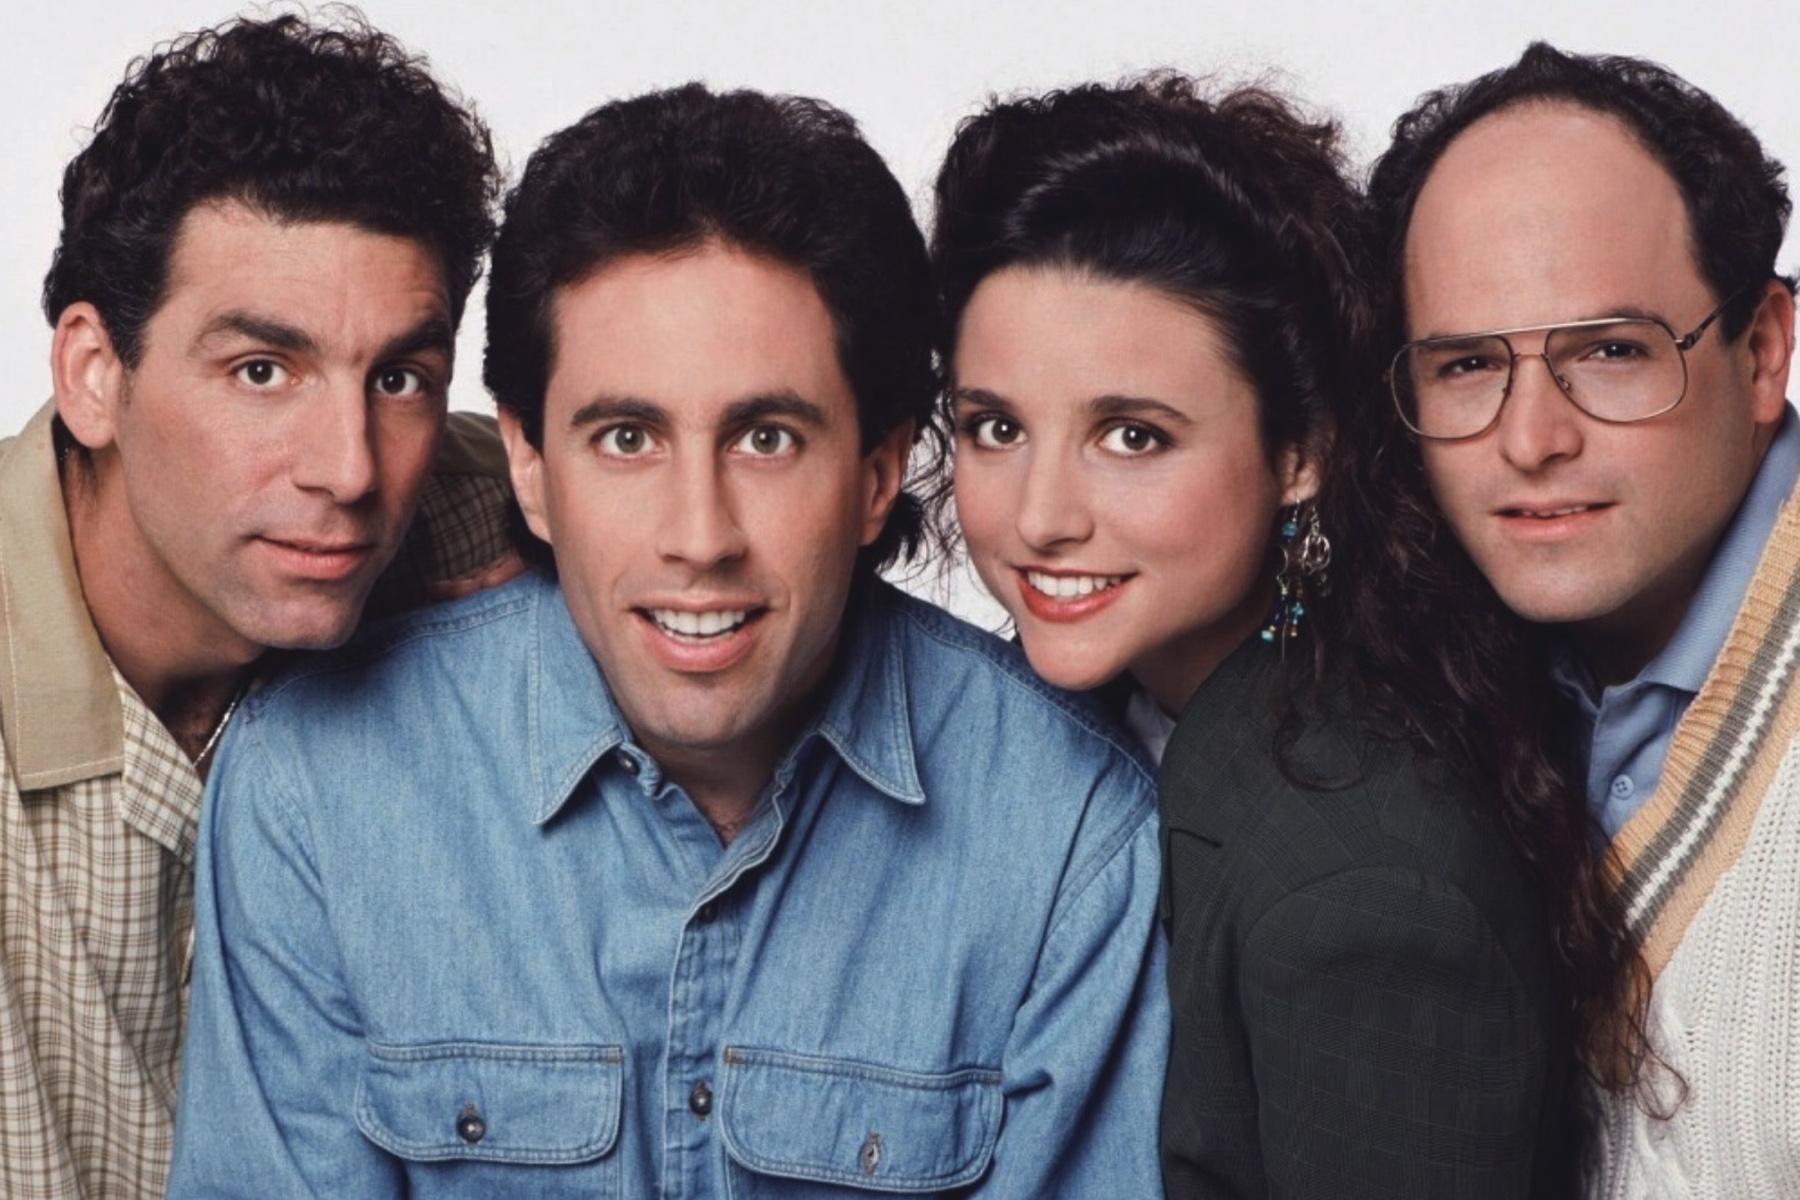 Seinfeld Koeln 1 Artikel – ©Netflix